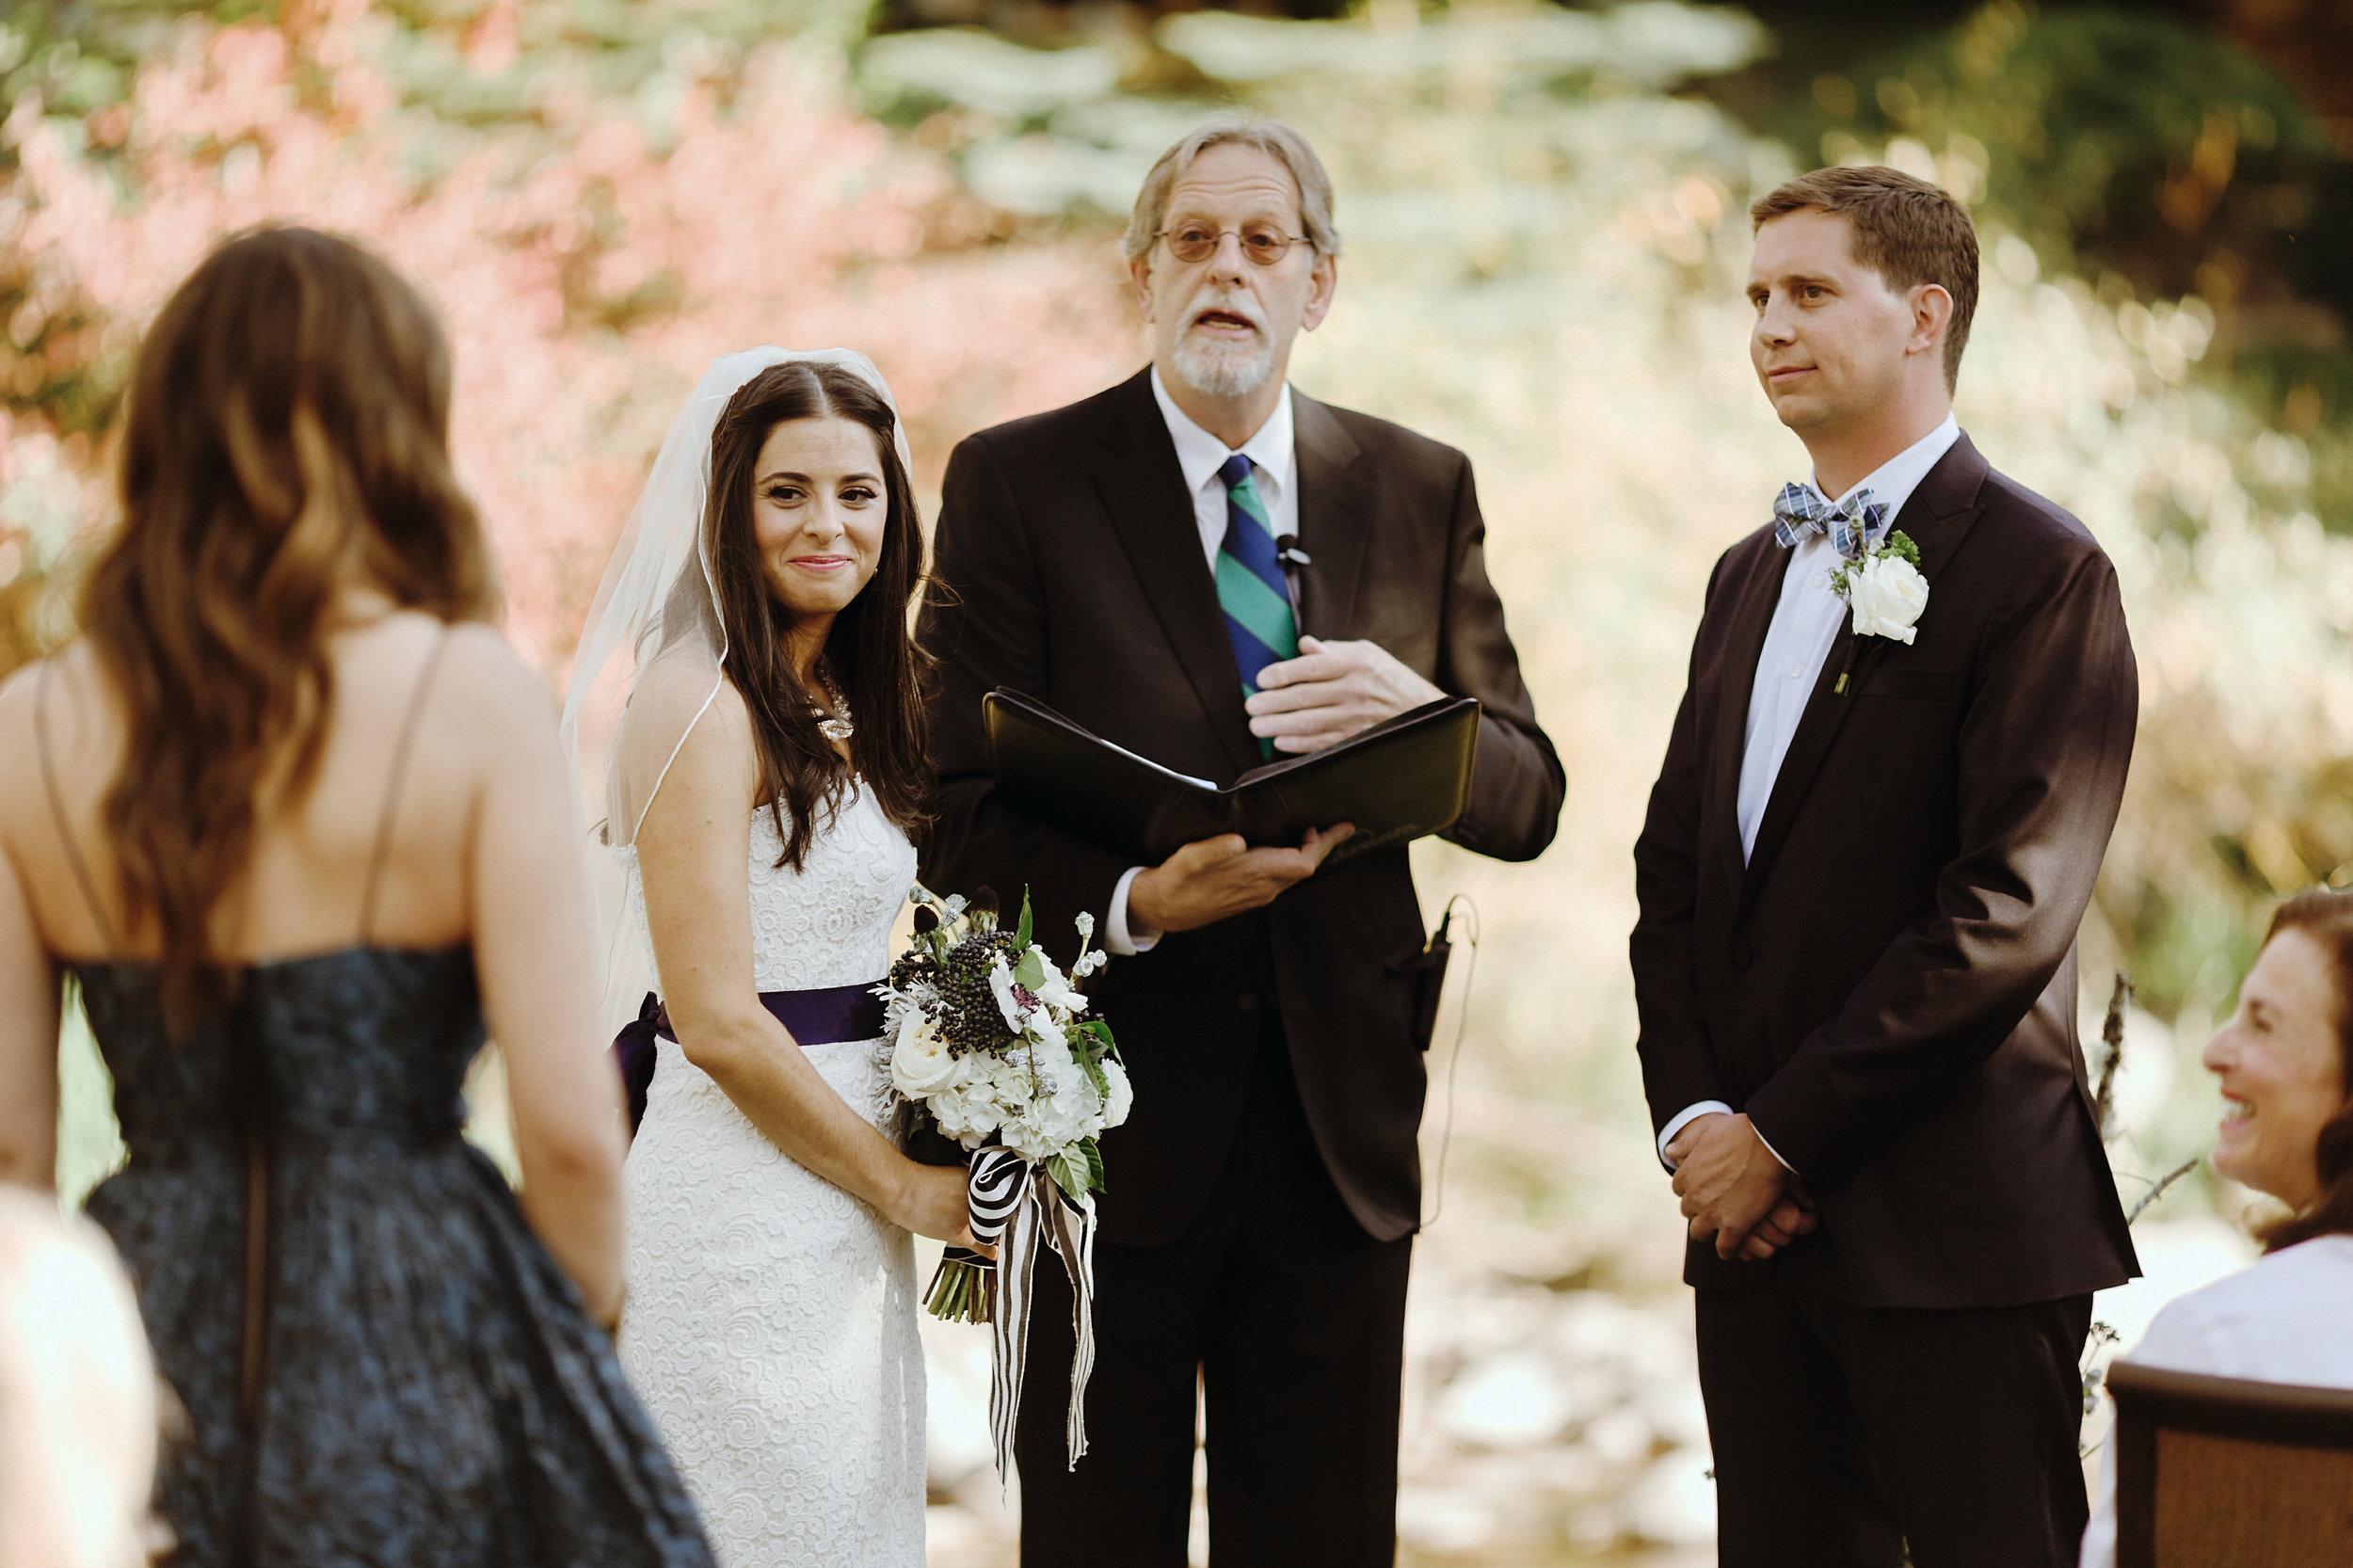 Jenny_Jeff_Vail_Wedding_10.jpg